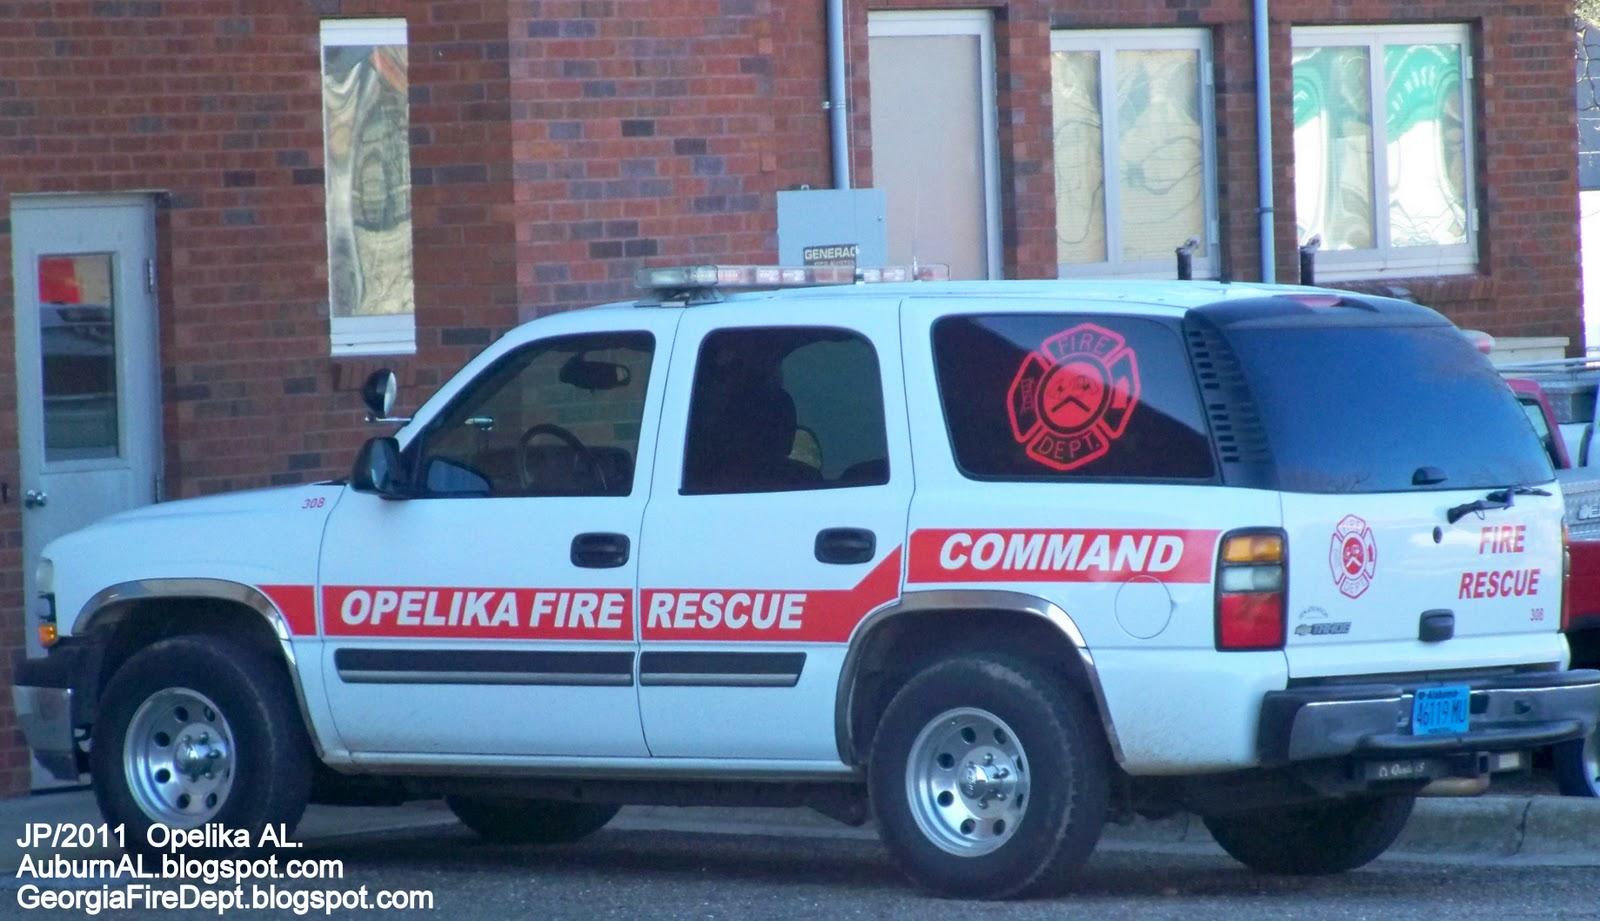 Alabama lee county salem - Opelika Fire Rescue Dept Station 4 Fire Chief Command Car Opelika Alabama Fire Department Lee County